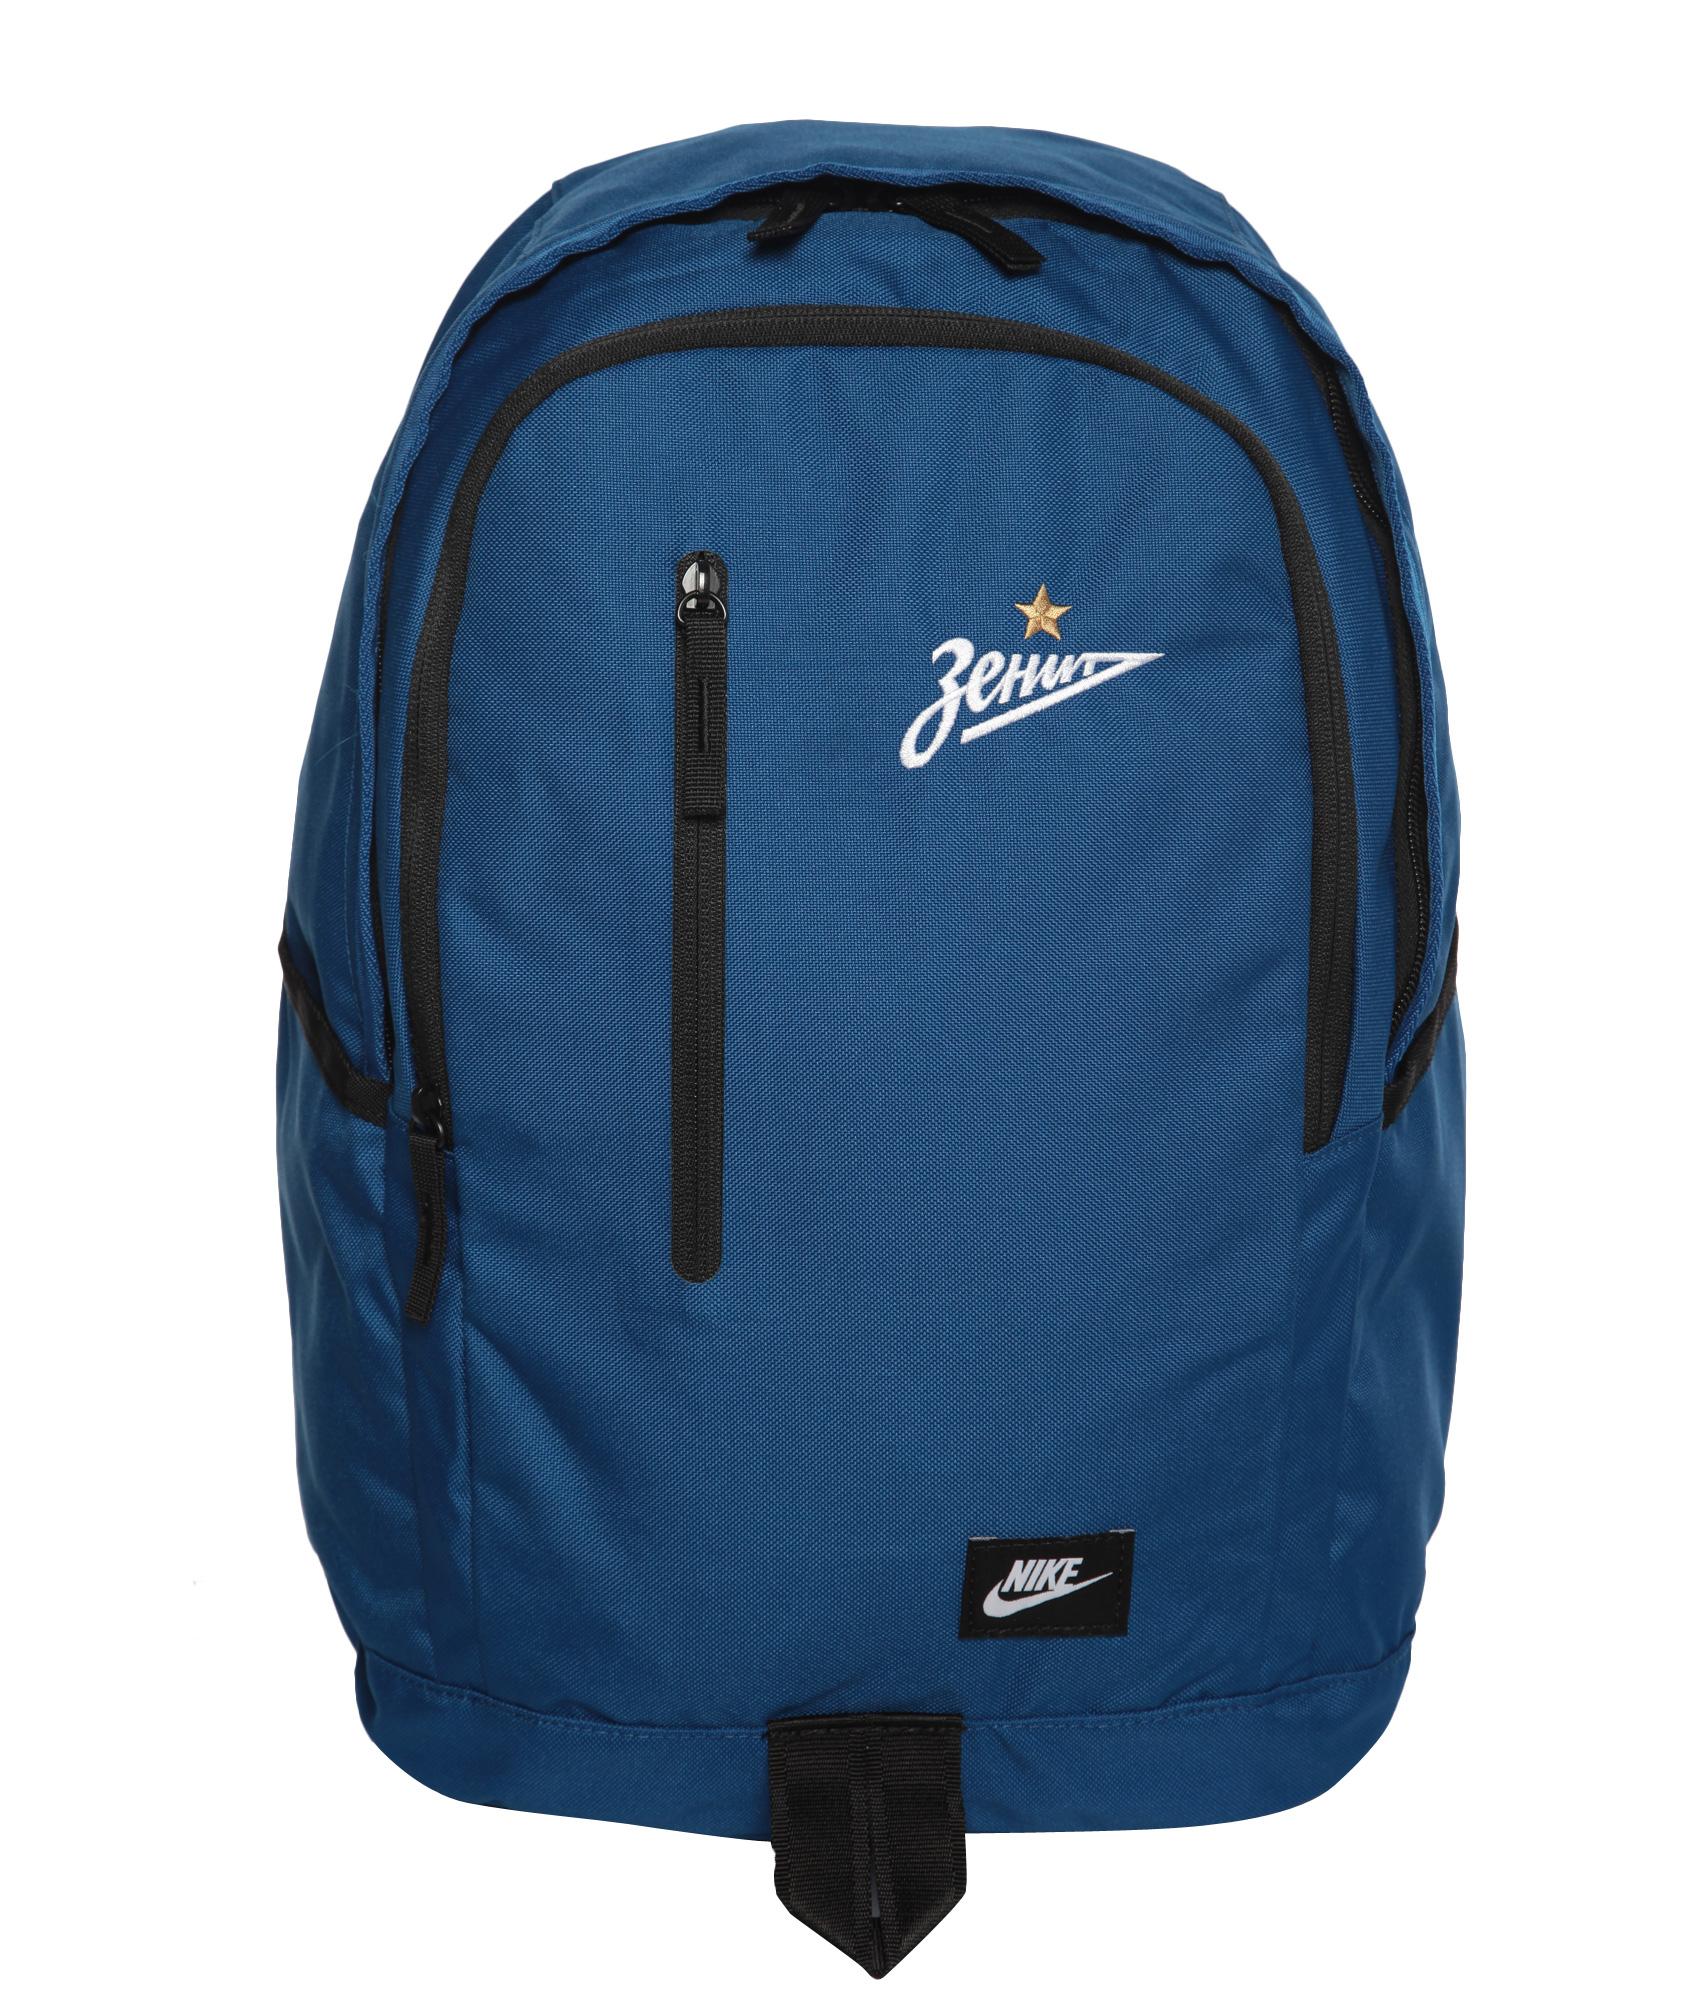 купить Рюкзак Nike, Цвет-Синий, Размер-MISC недорого